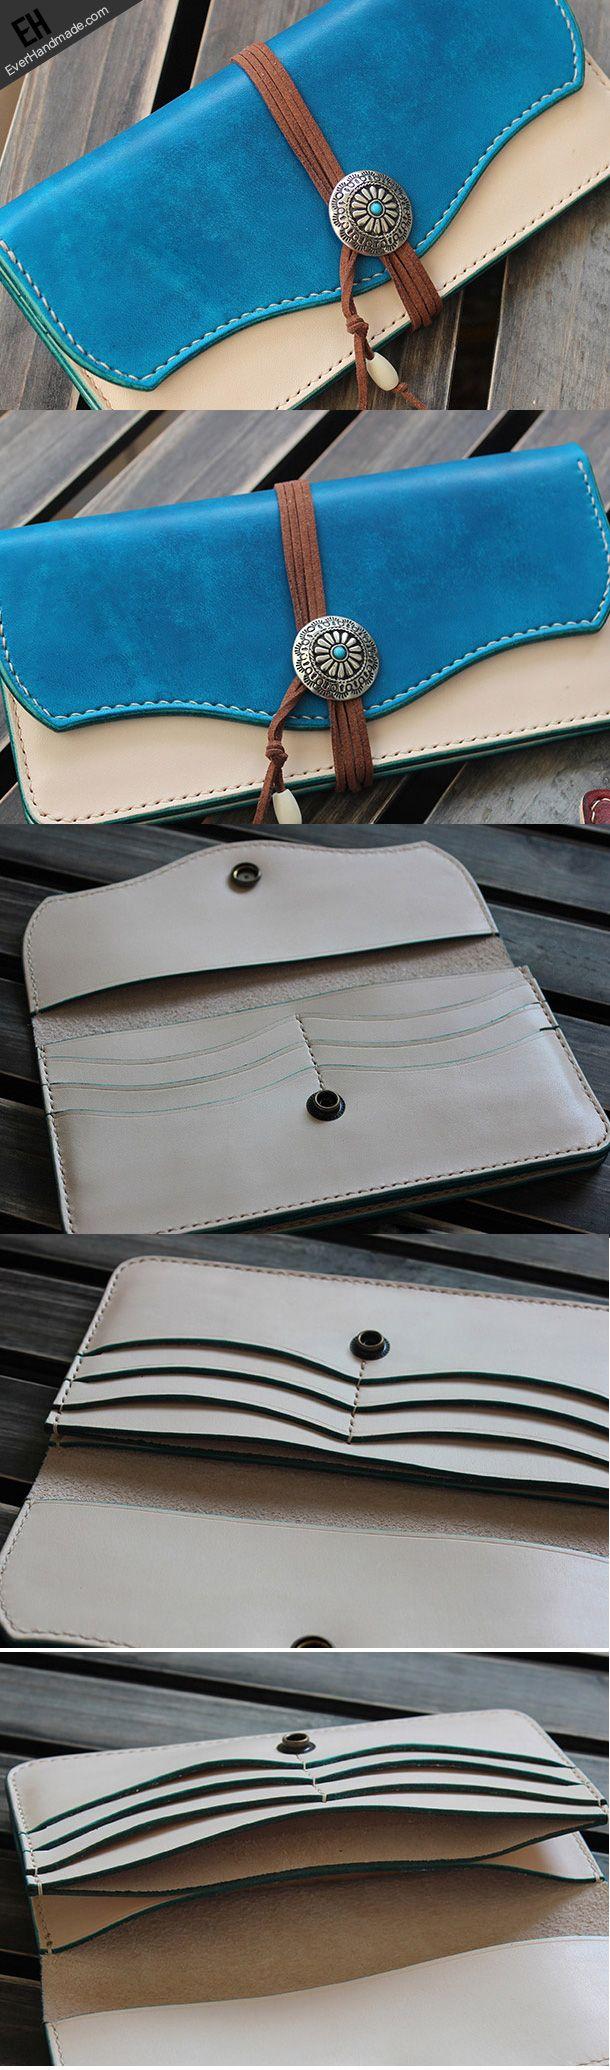 Handmade custom vintage purse leather wallet long phone wallet blue women